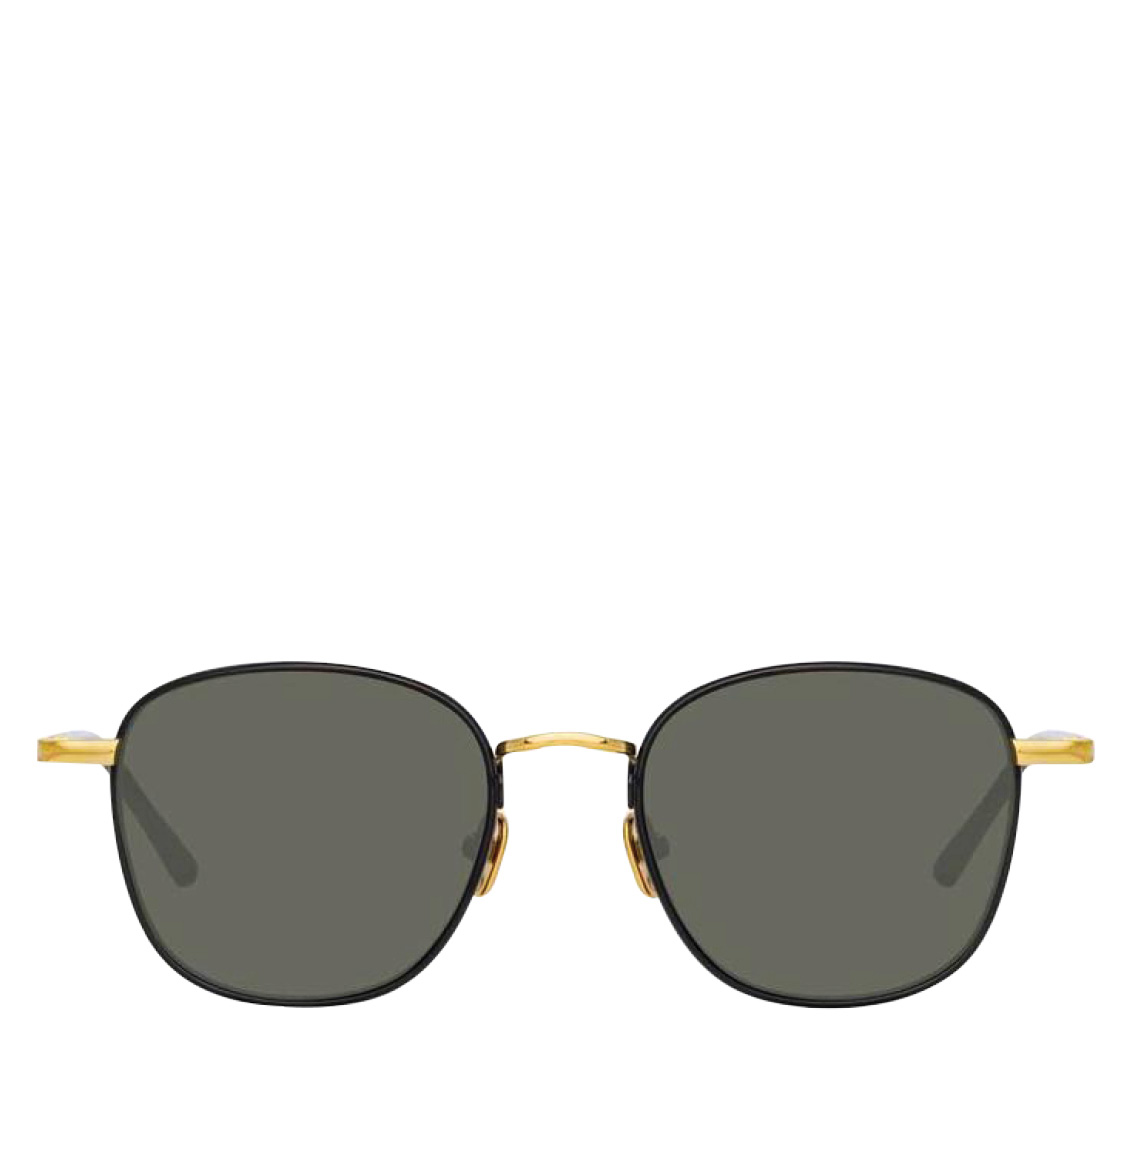 Linda Farrow 953 C1 Square Gold-Plated Βlack Italian Αcetate 49 Γυαλιά Ηλίου